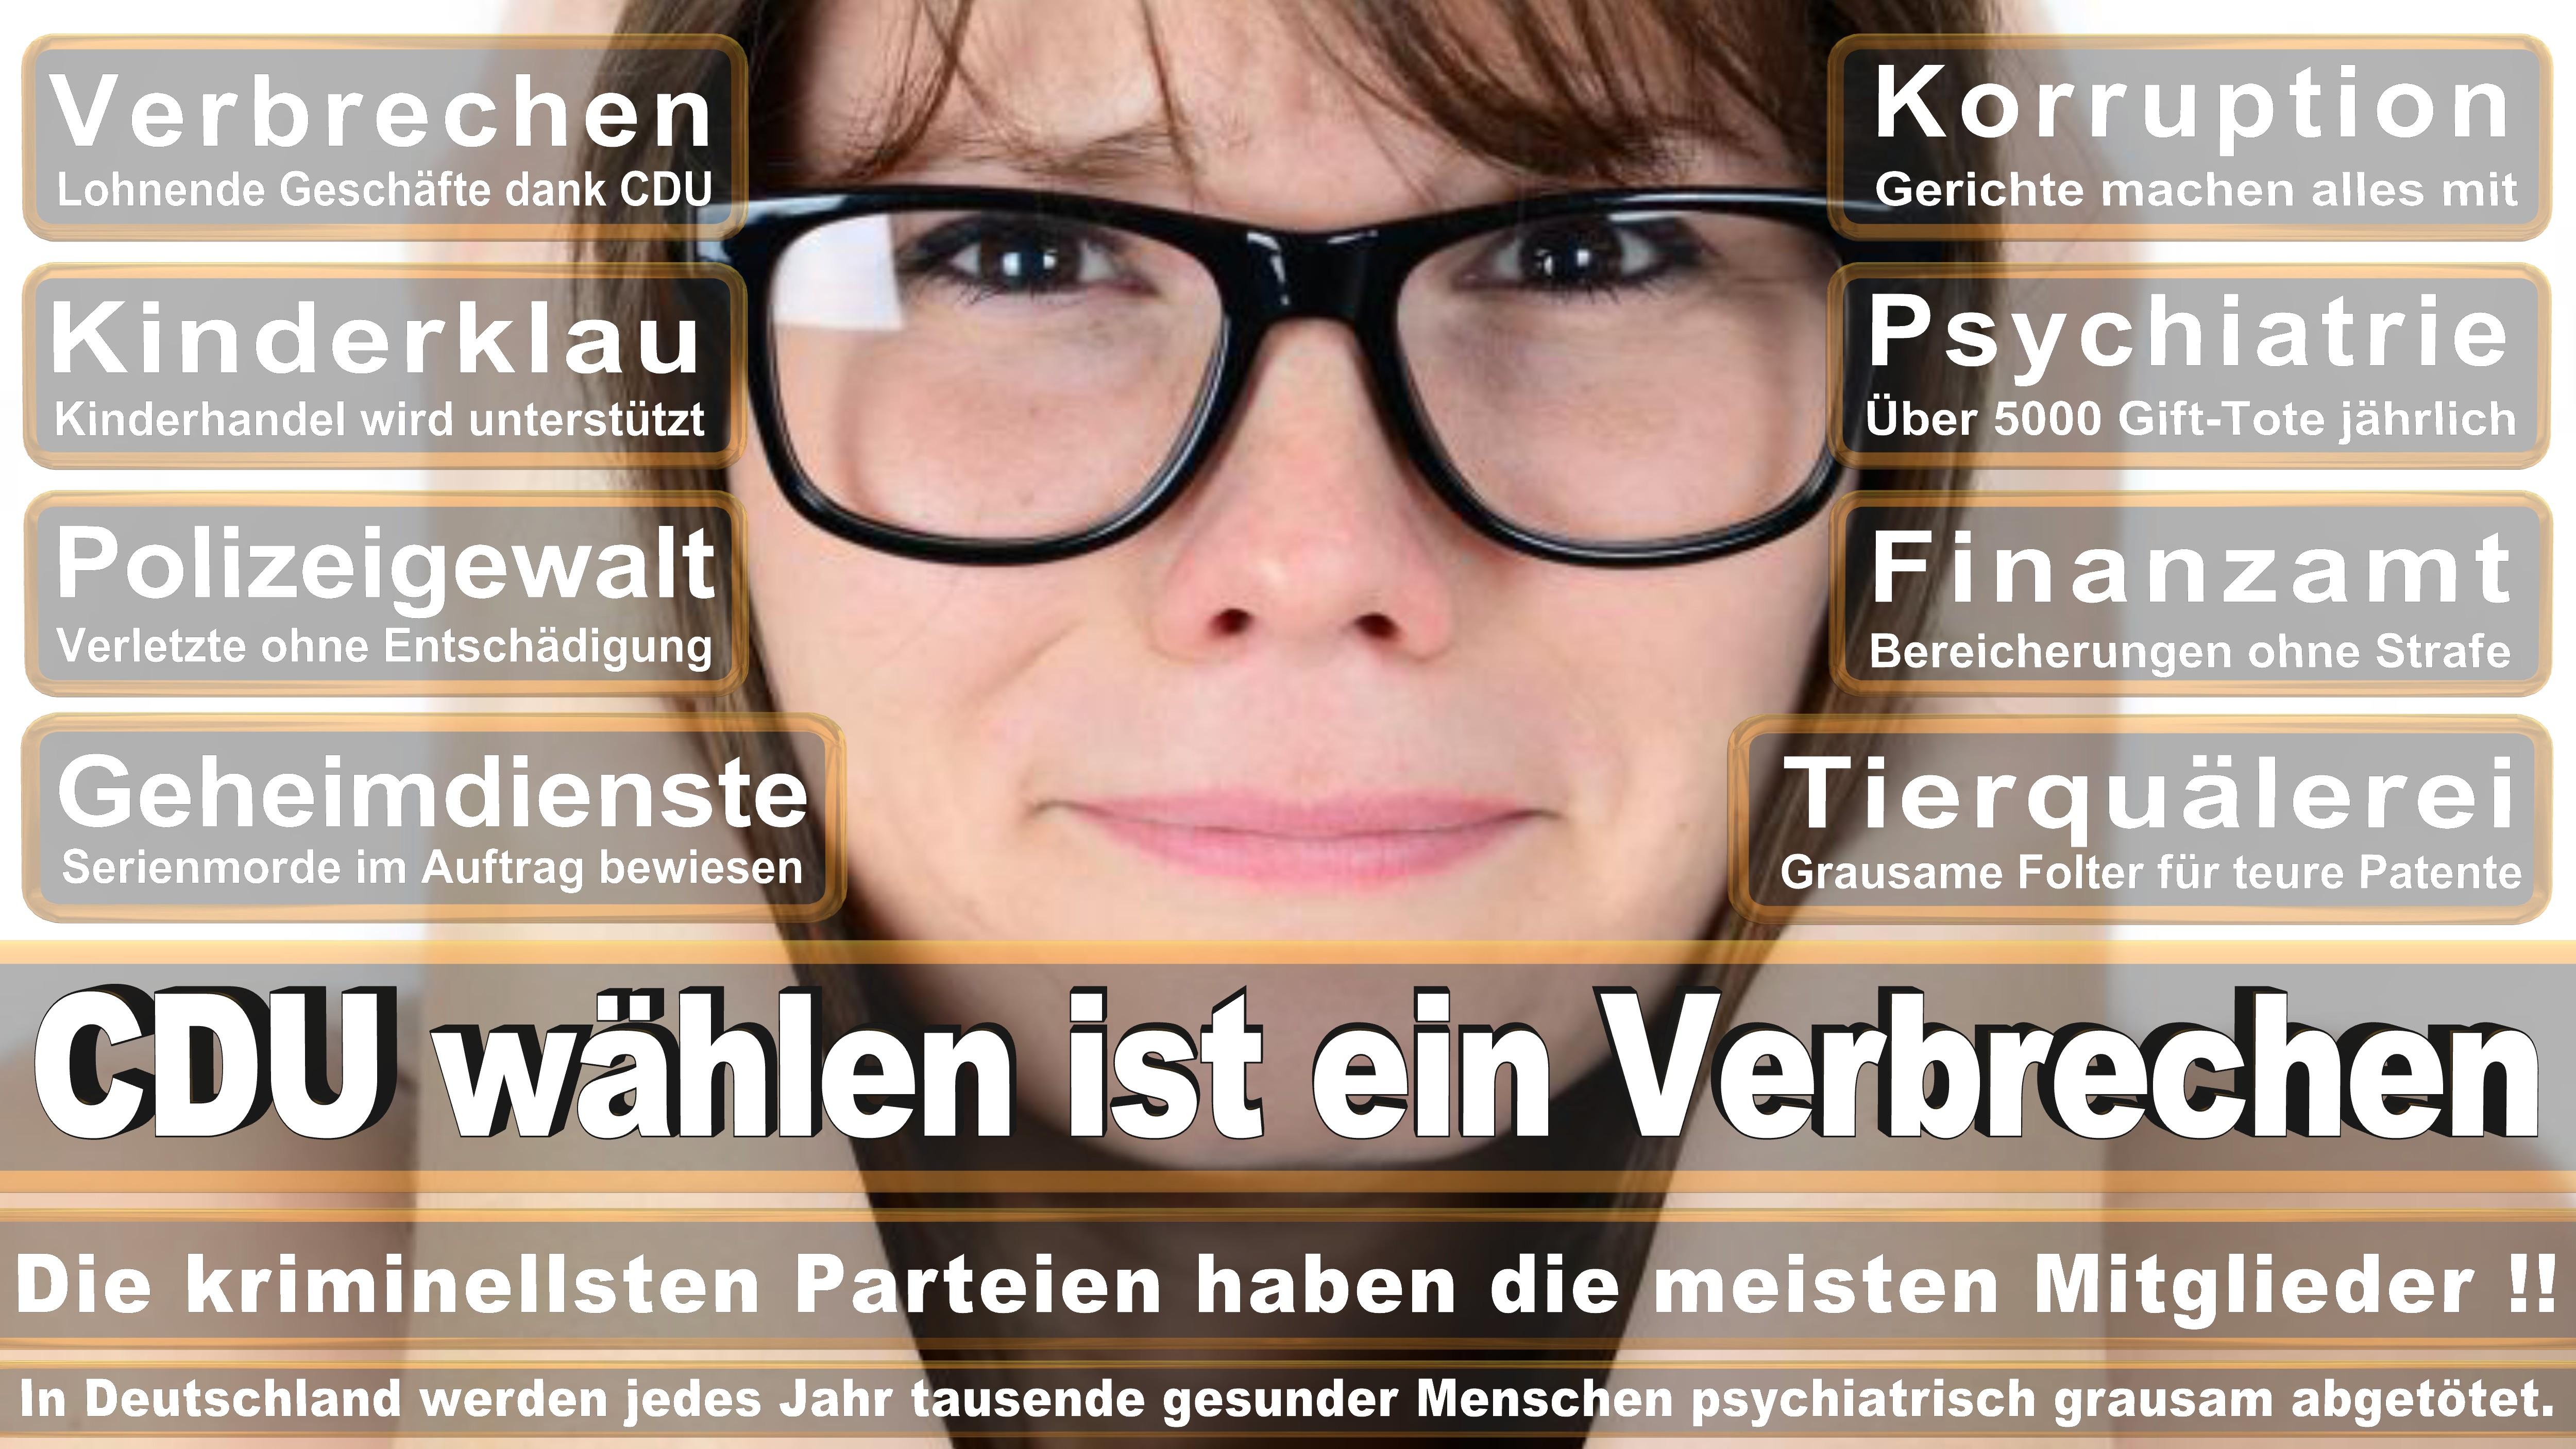 Angela-Merkel (416)